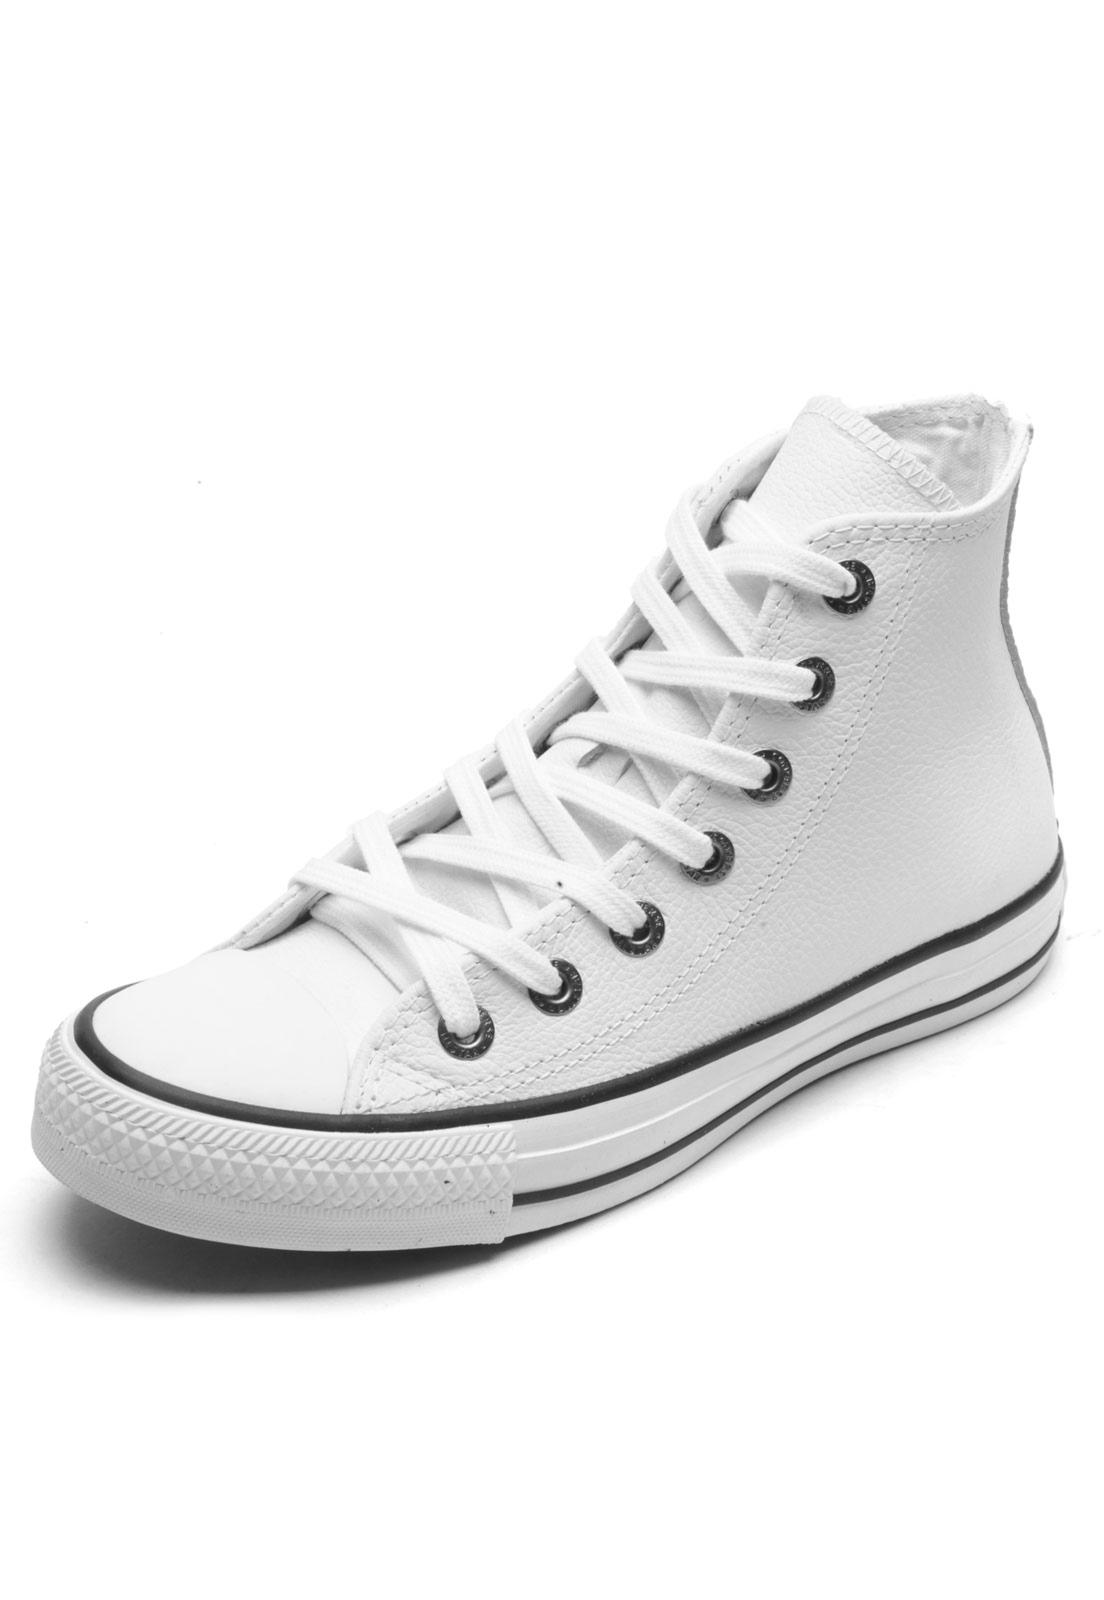 07c4c9d3d Tênis Converse Chuck Taylor All Star Hi Branco